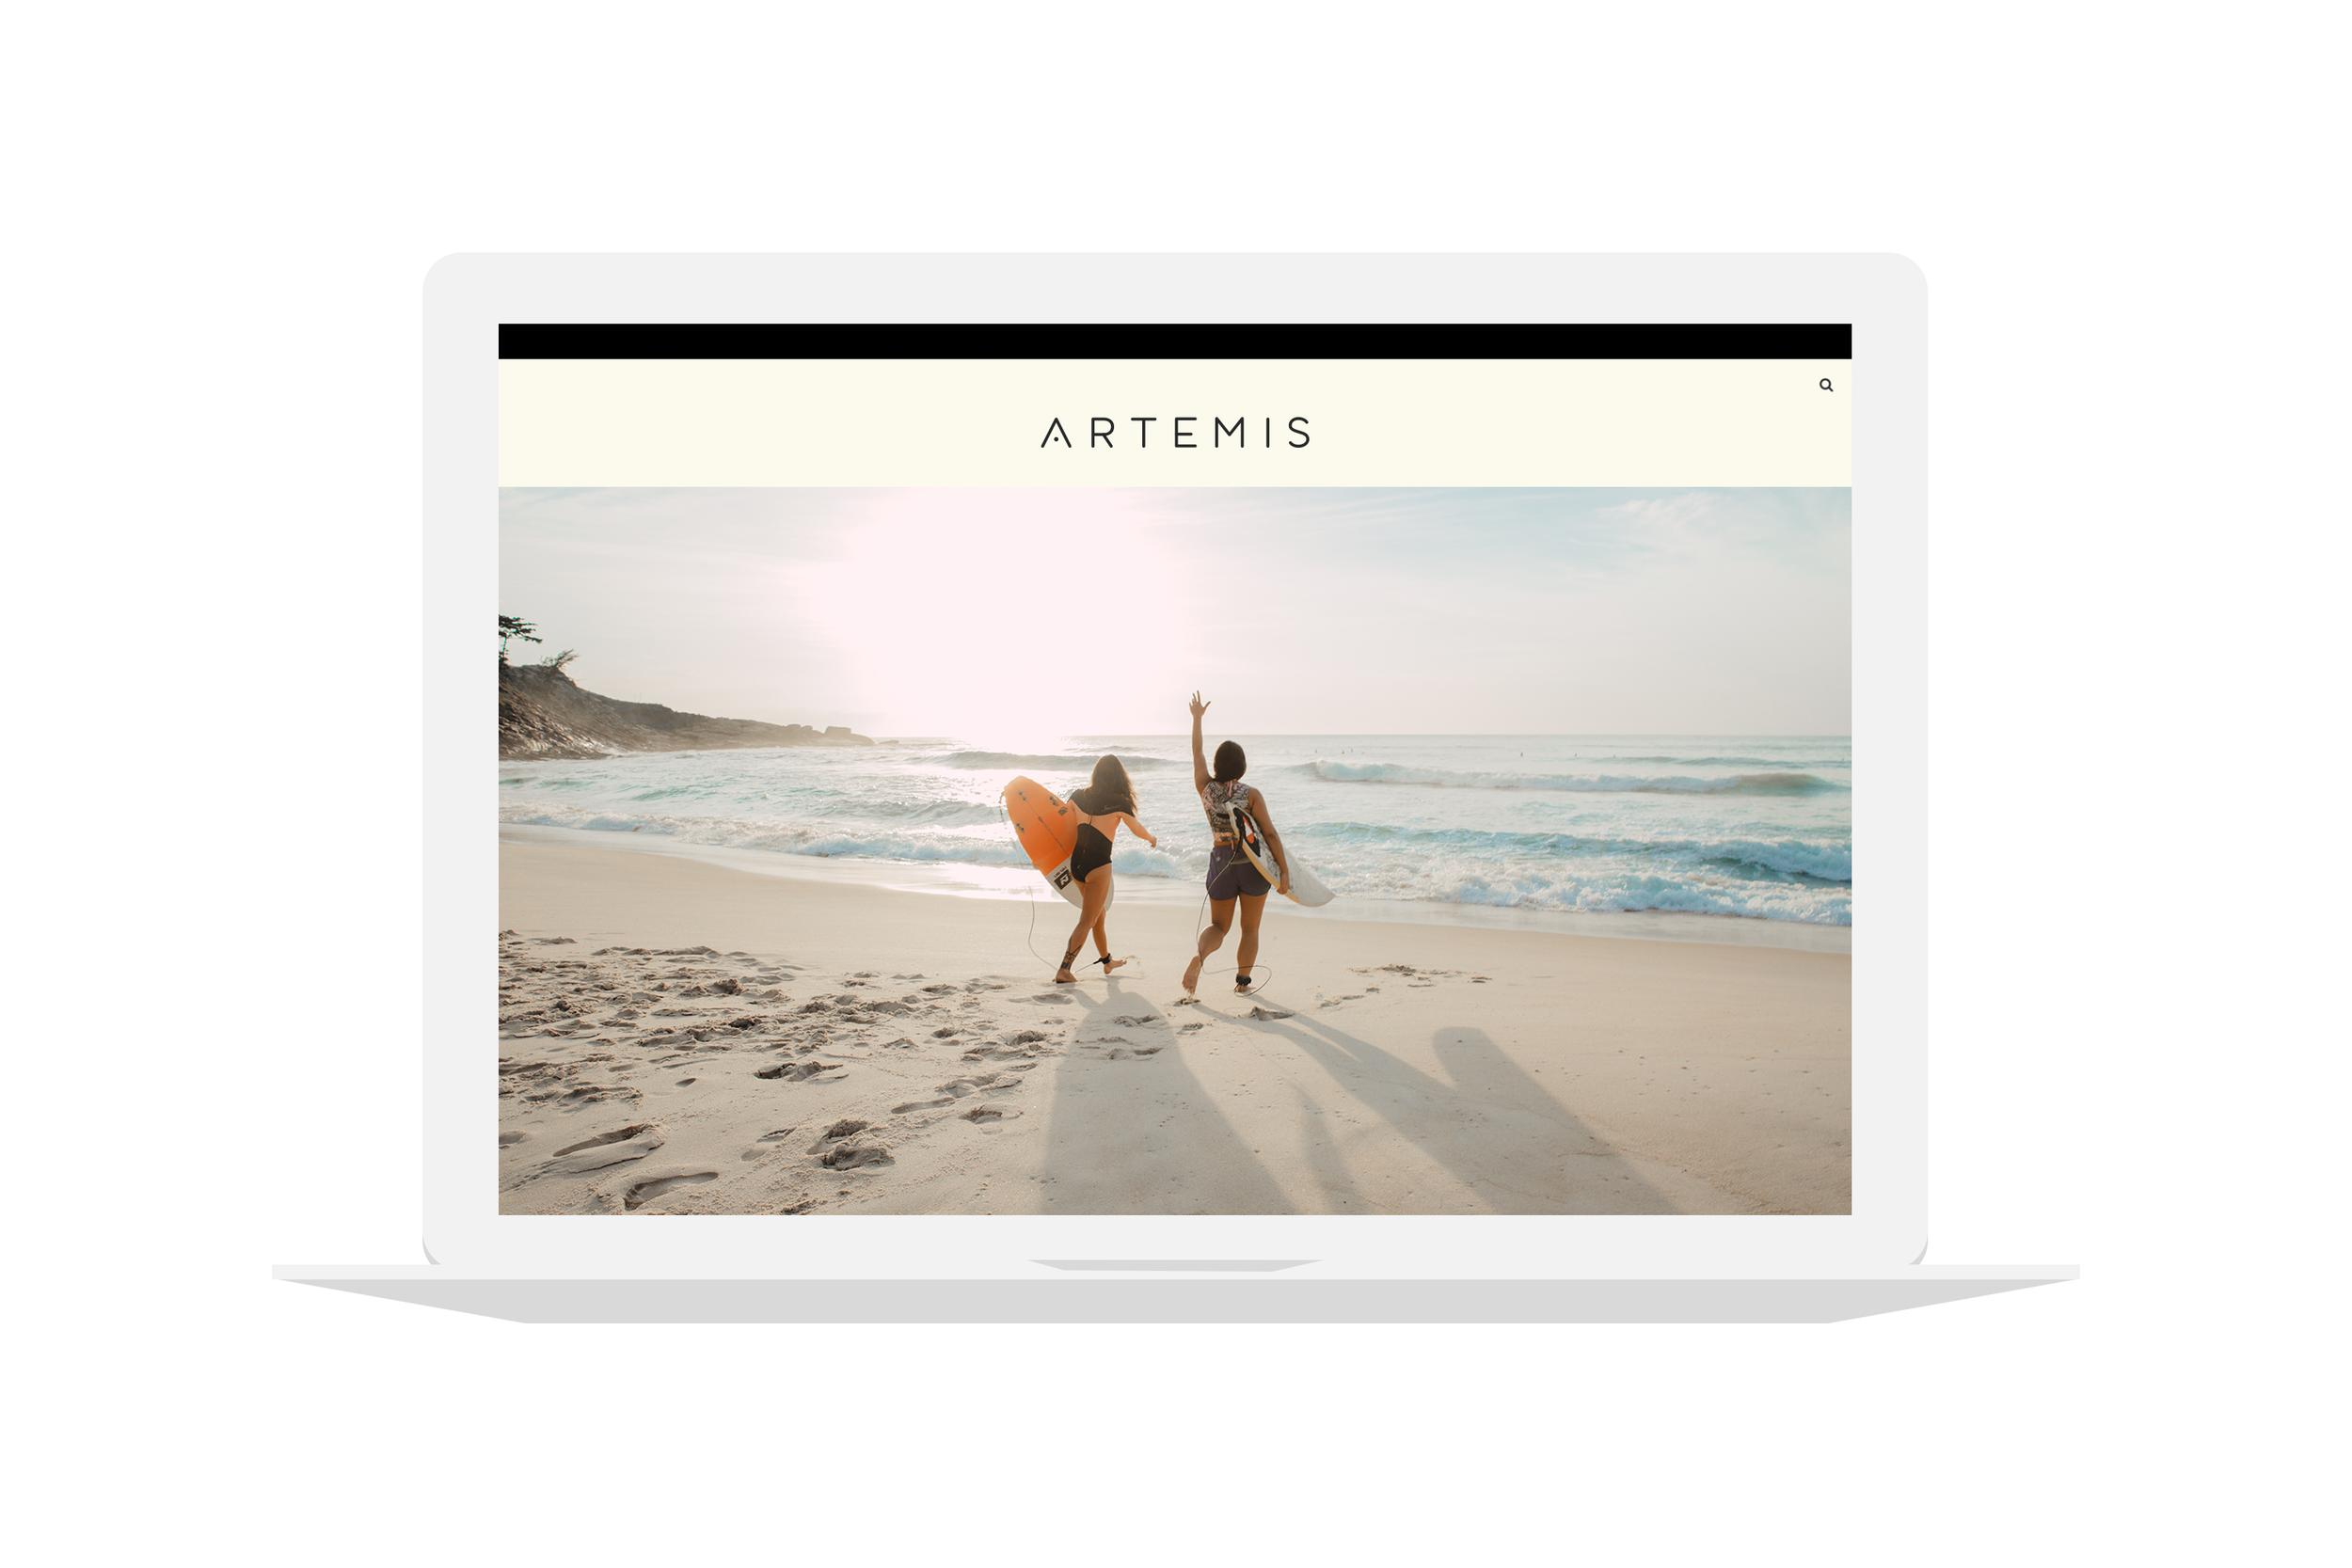 chrissihernandez-artemis-branding-desktop.jpg